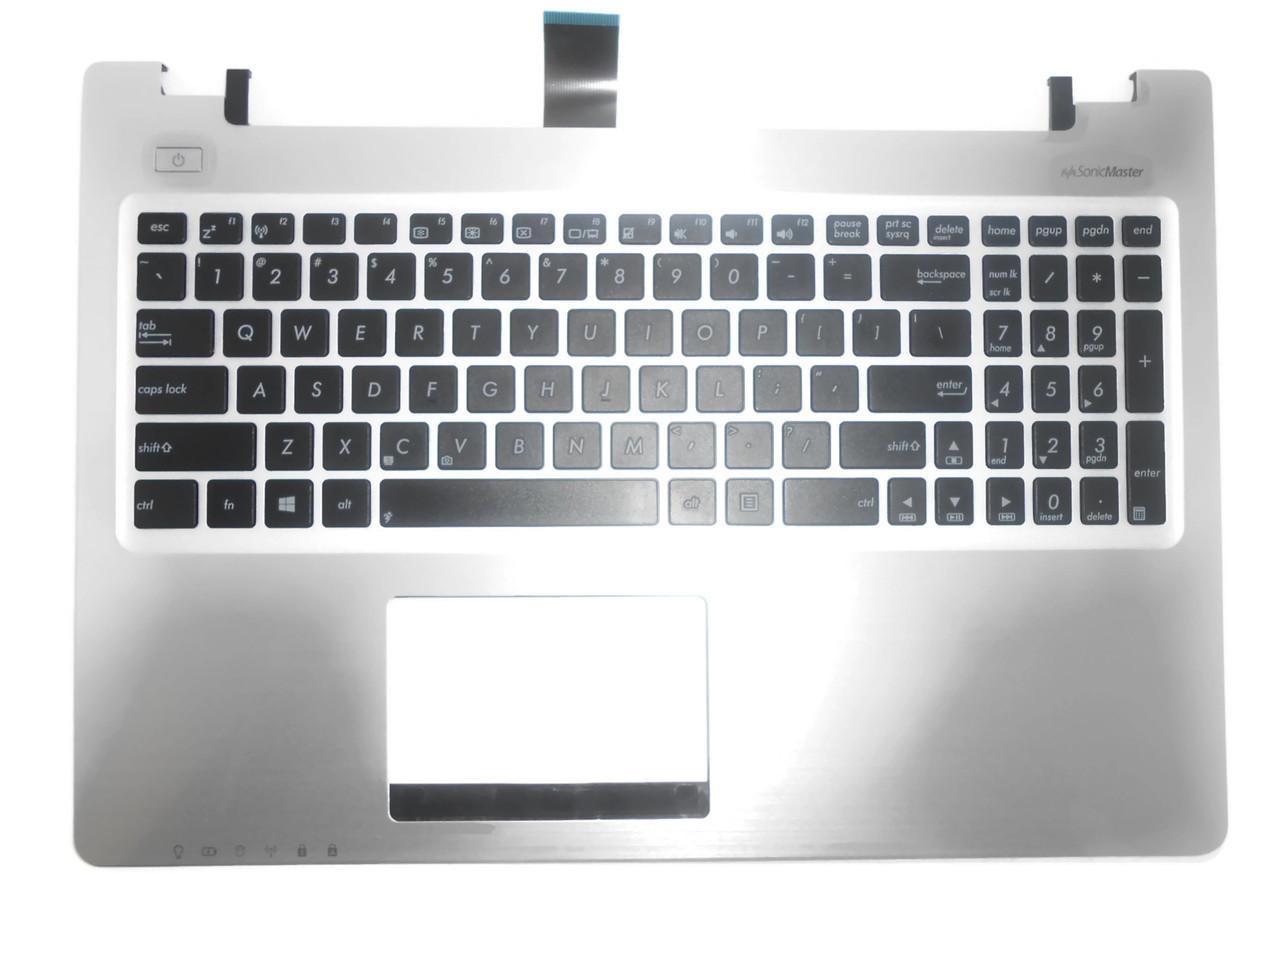 Asus K56CM Touchpad Windows 8 X64 Treiber